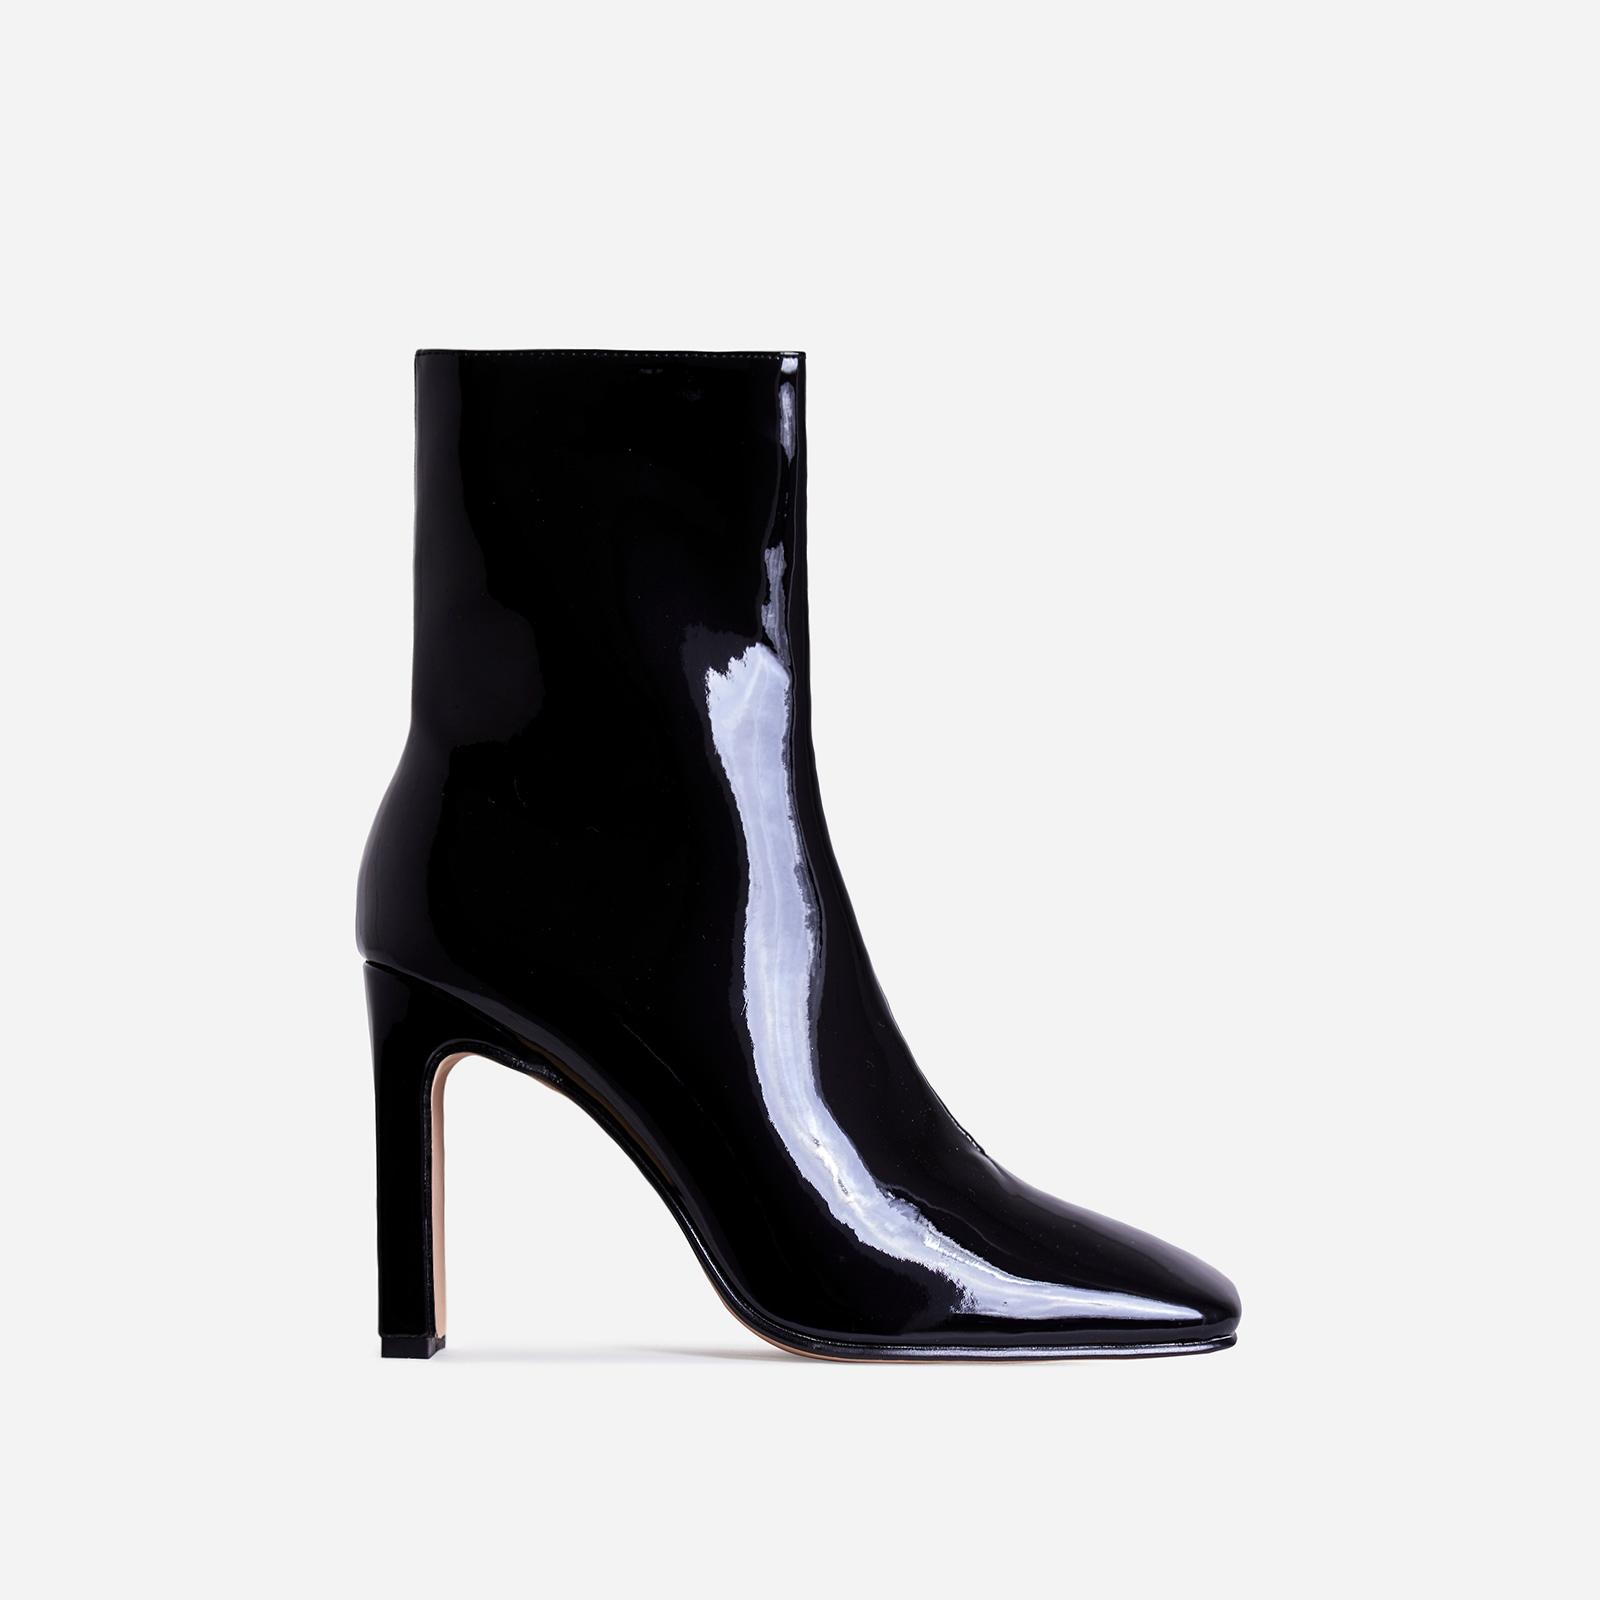 Klass Square Toe Thin Block Heel Ankle Boot In Black Patent